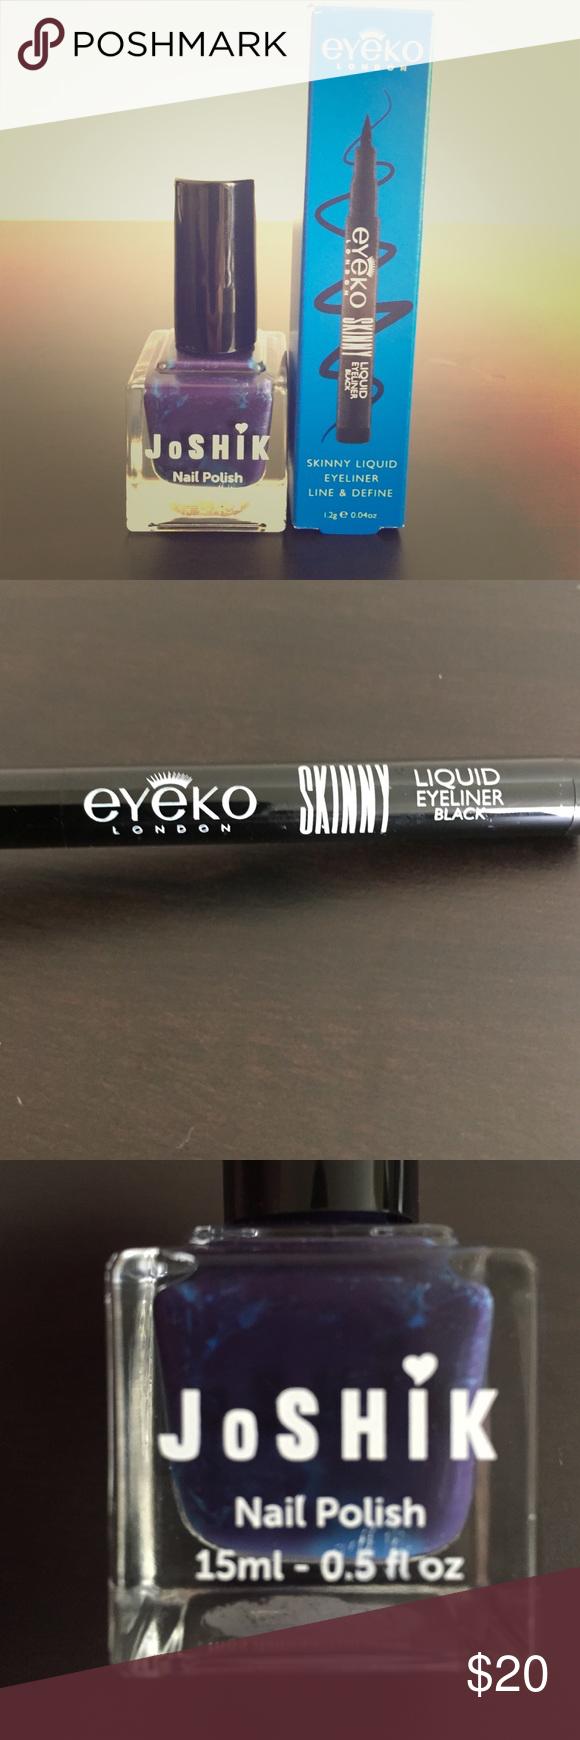 Brand new!! Beauty bundle! NWT | Eyeliner, Polish and Nails